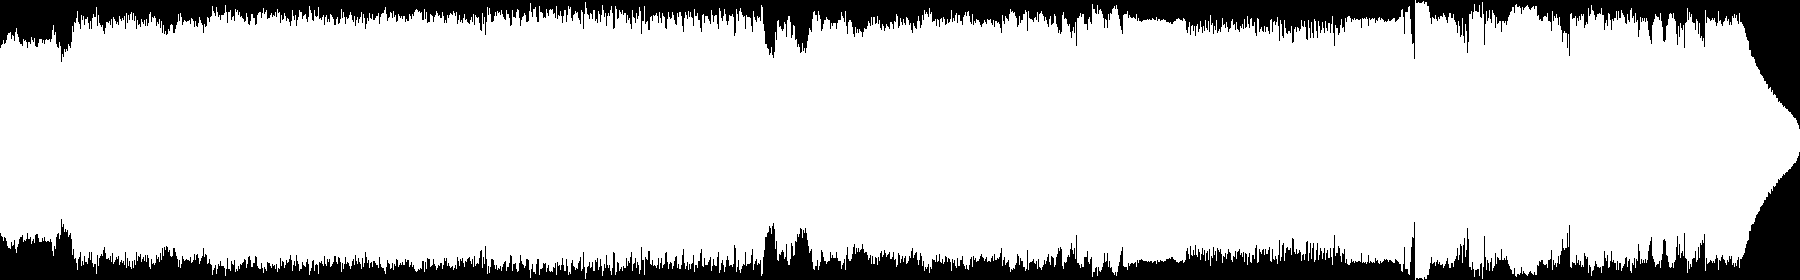 Empyrean (U-he Zebra Presets) audio waveform